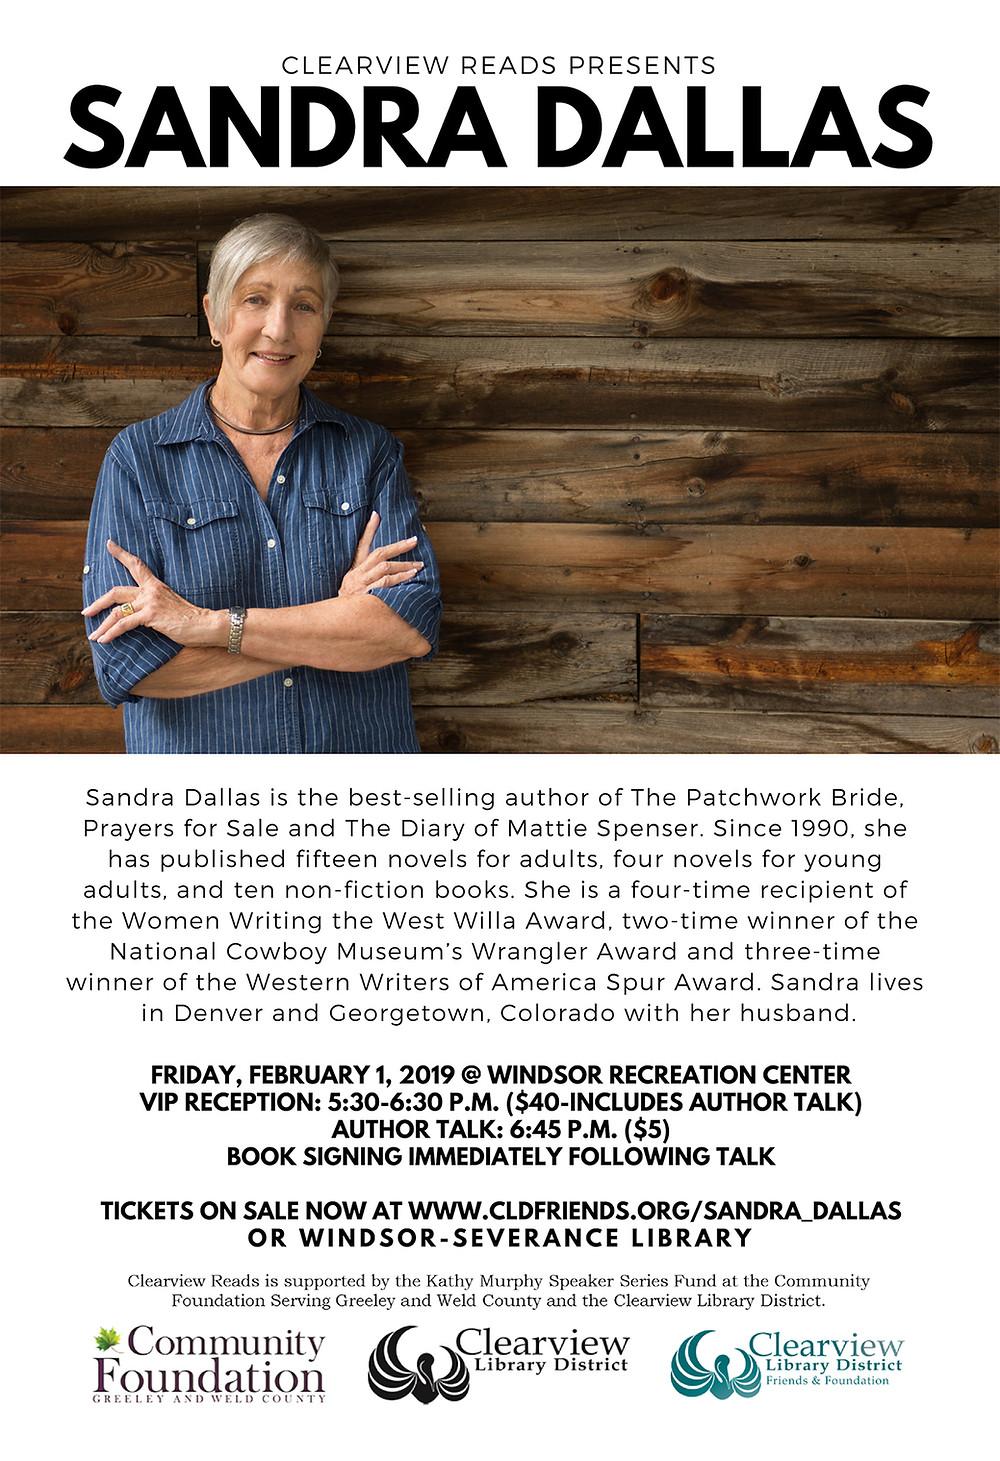 Sandra Dallas speaking at Windsor Recreation Center on February 1, 2019 5:30pm - 8:30pm